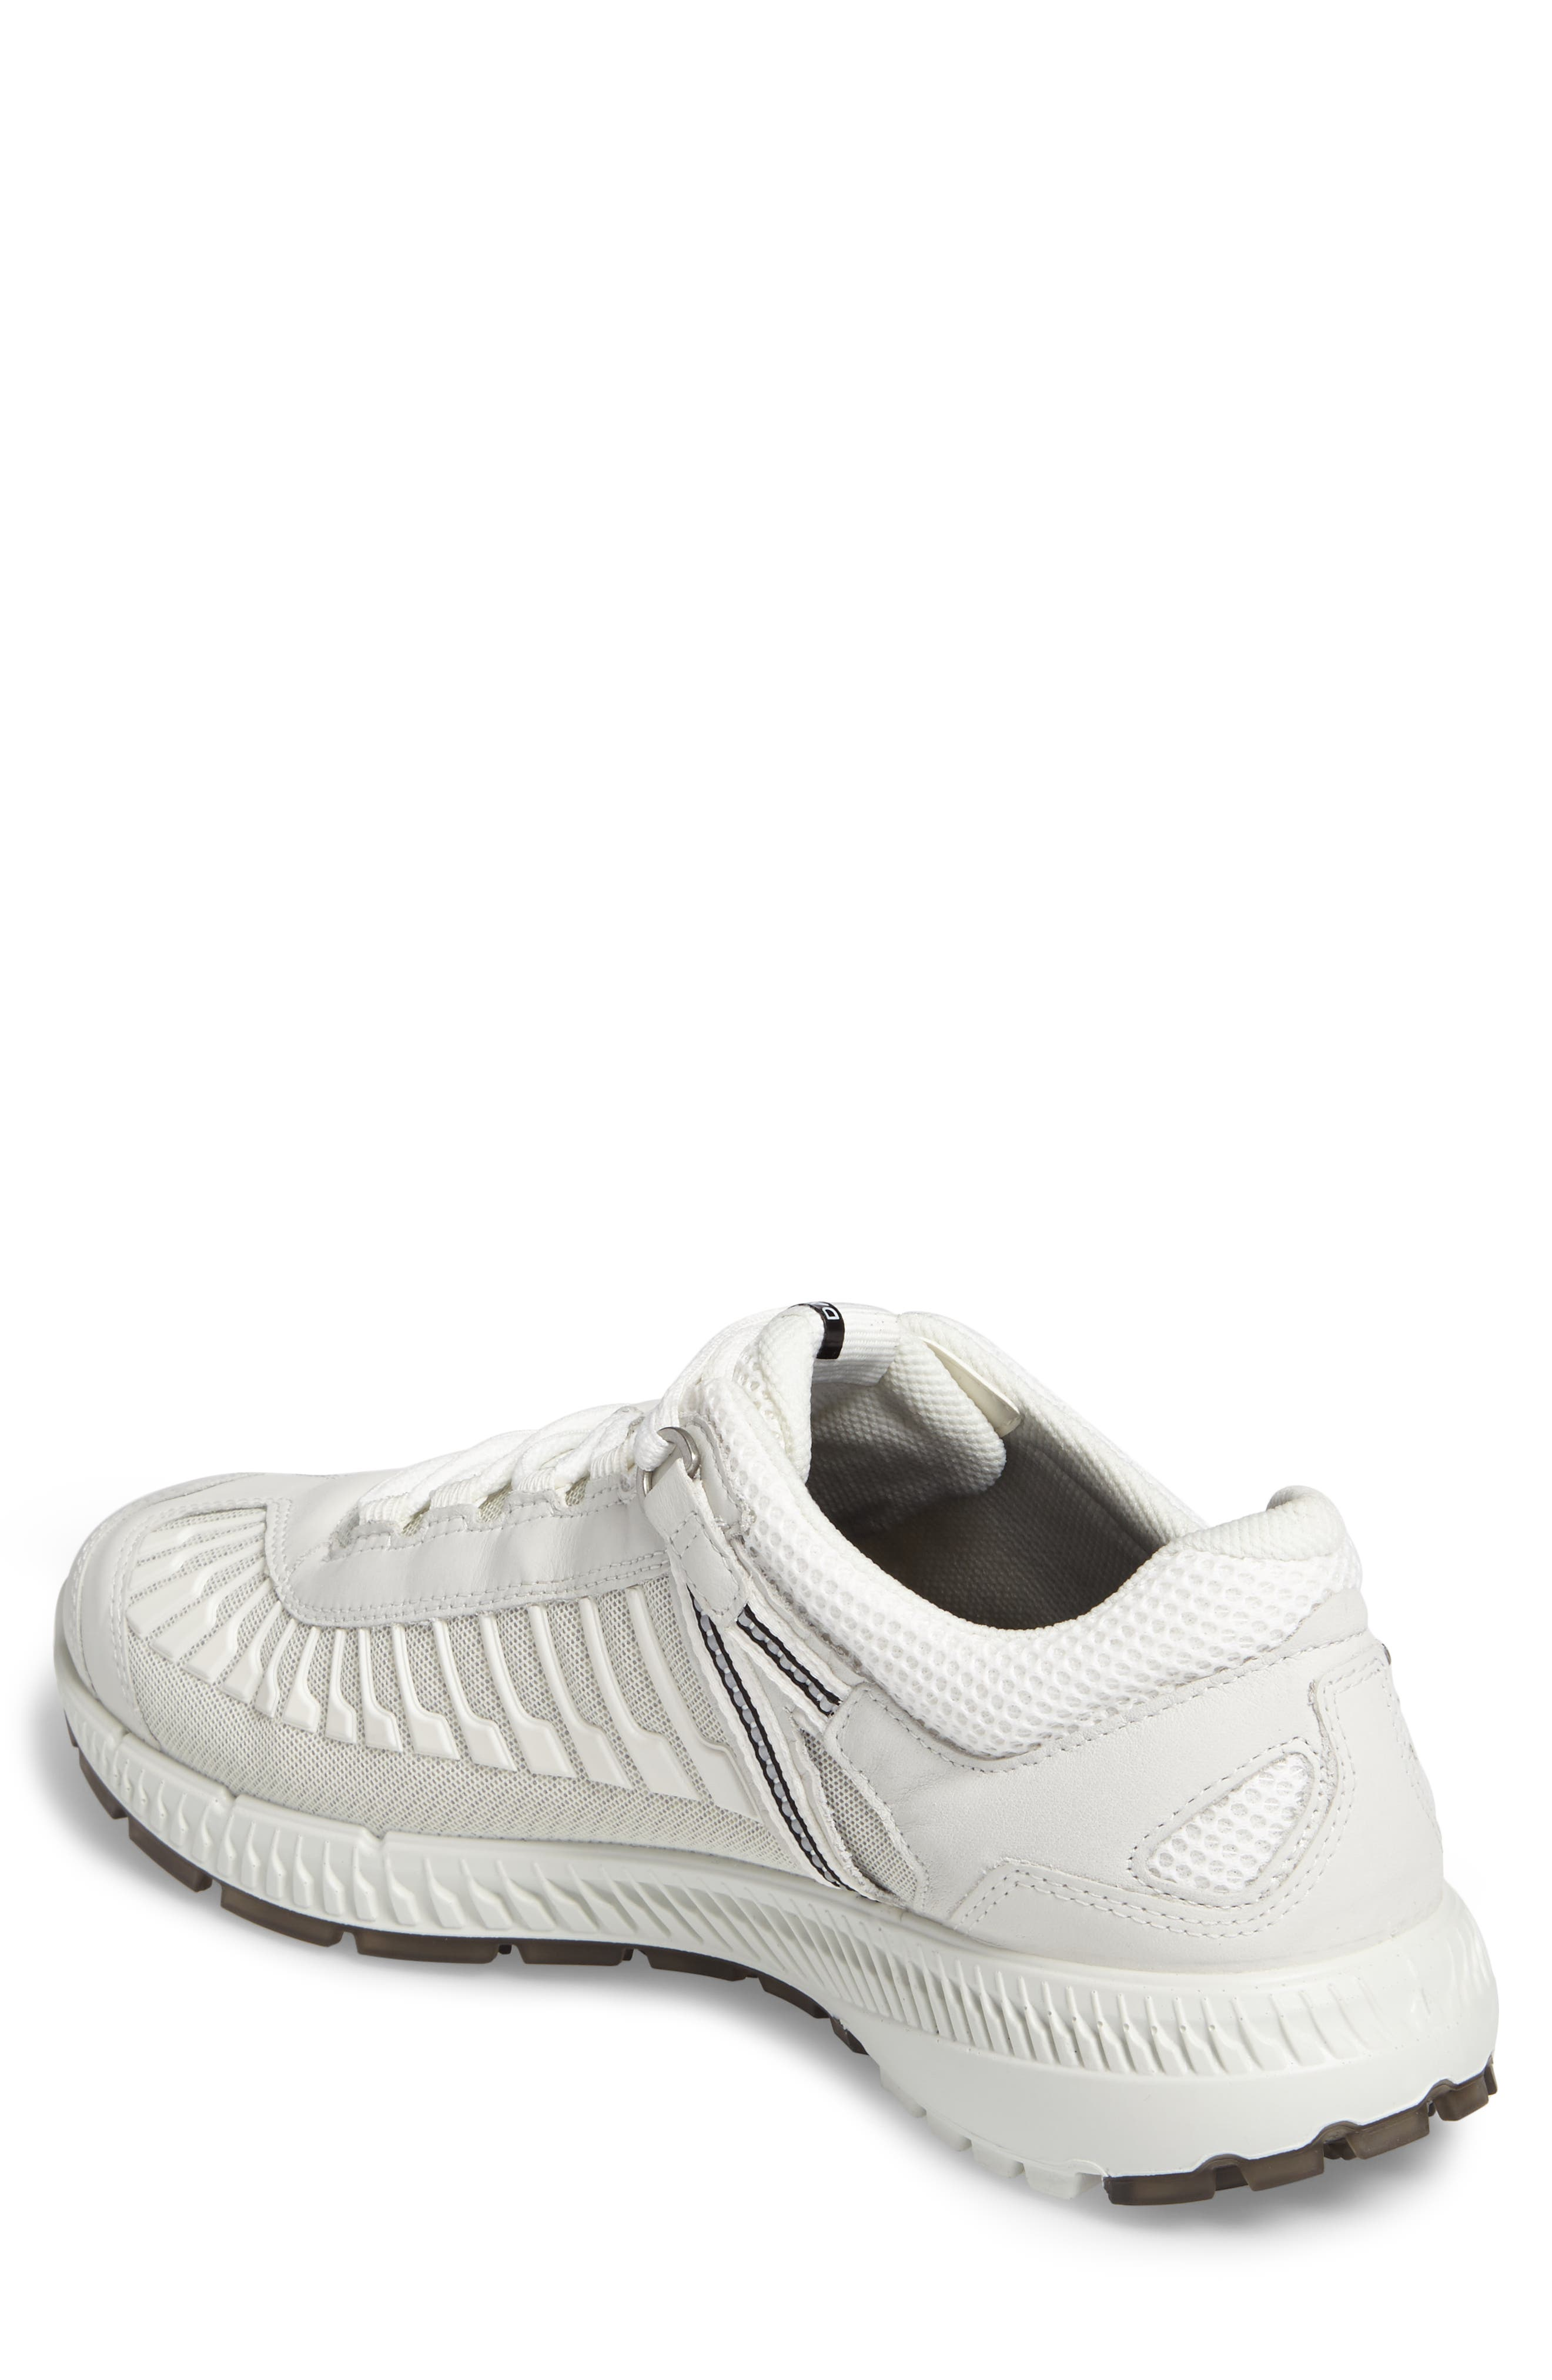 Intrinsic TR Run Sneaker,                             Alternate thumbnail 2, color,                             White Leather